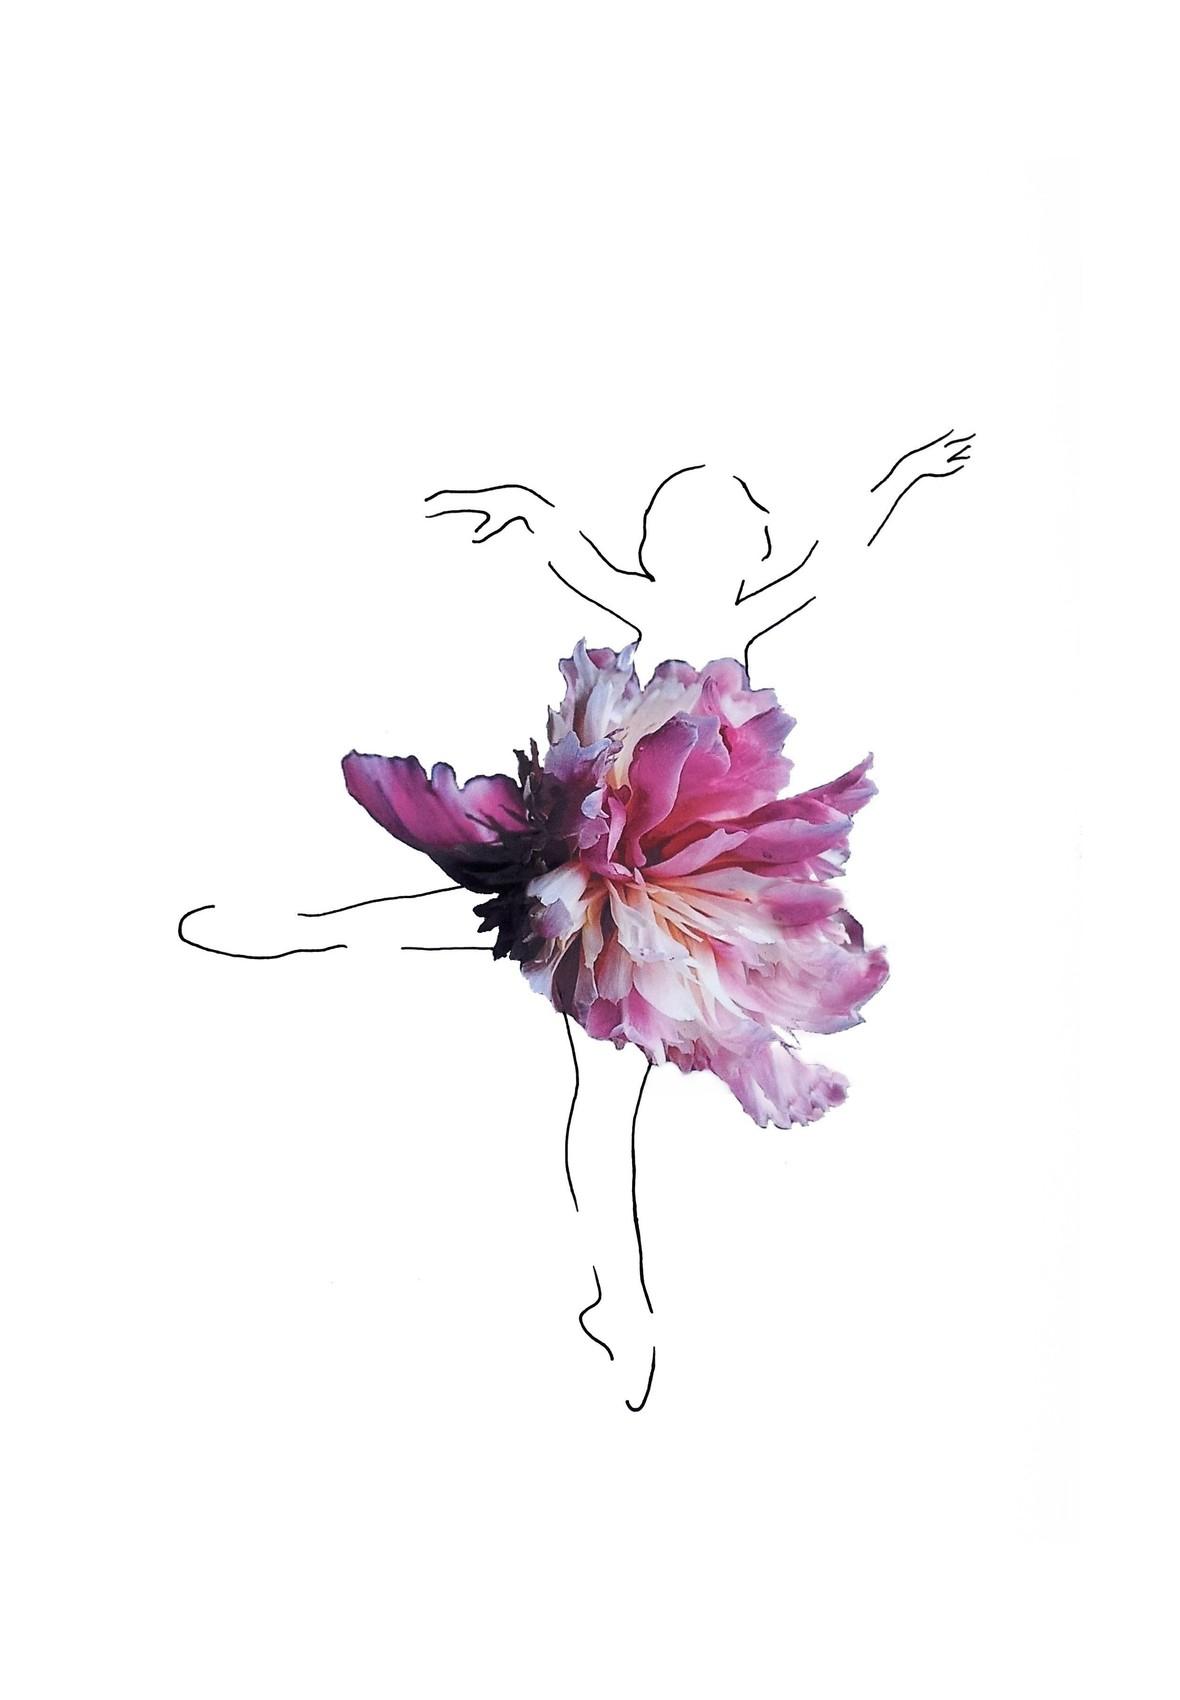 Fleur tutu ou tutu fleur...